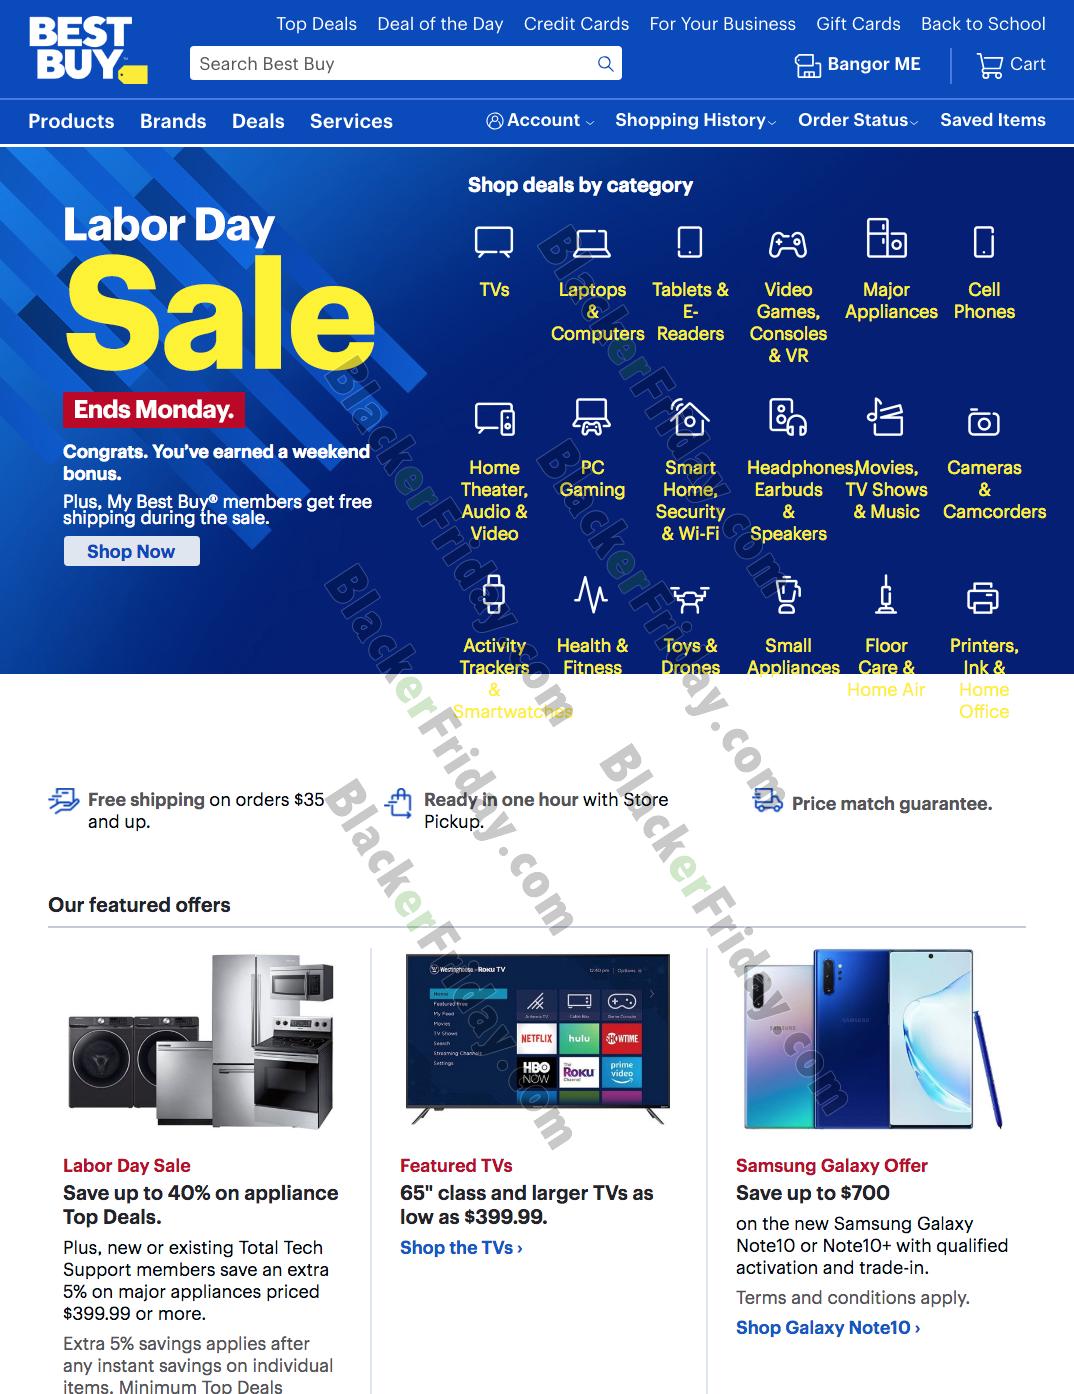 Best Buy Labor Day Sale 2021 Blacker Friday